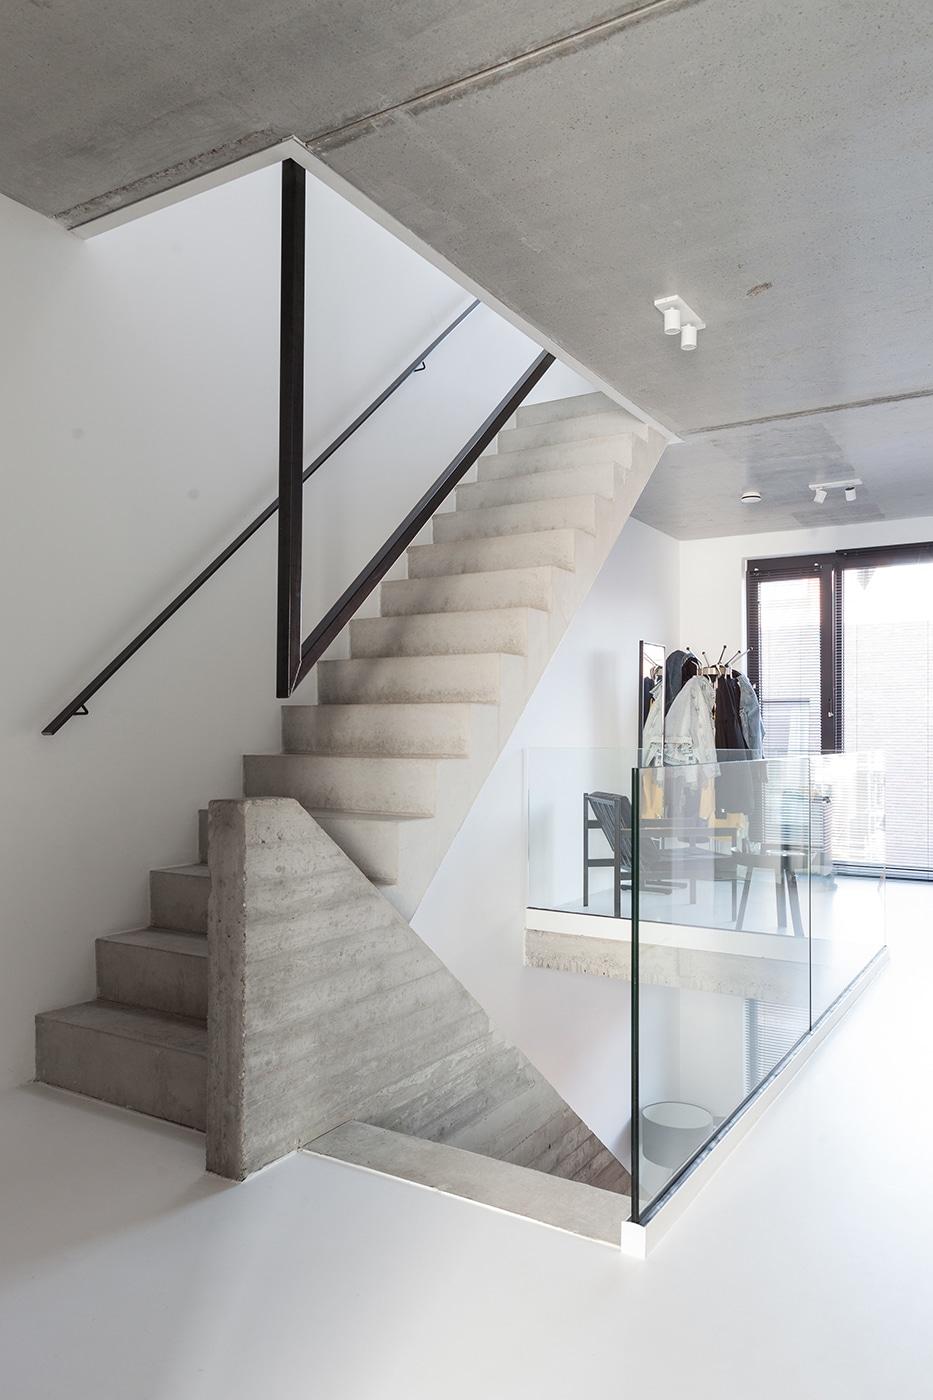 Stadsloft RF interieur 3 trap verdieping